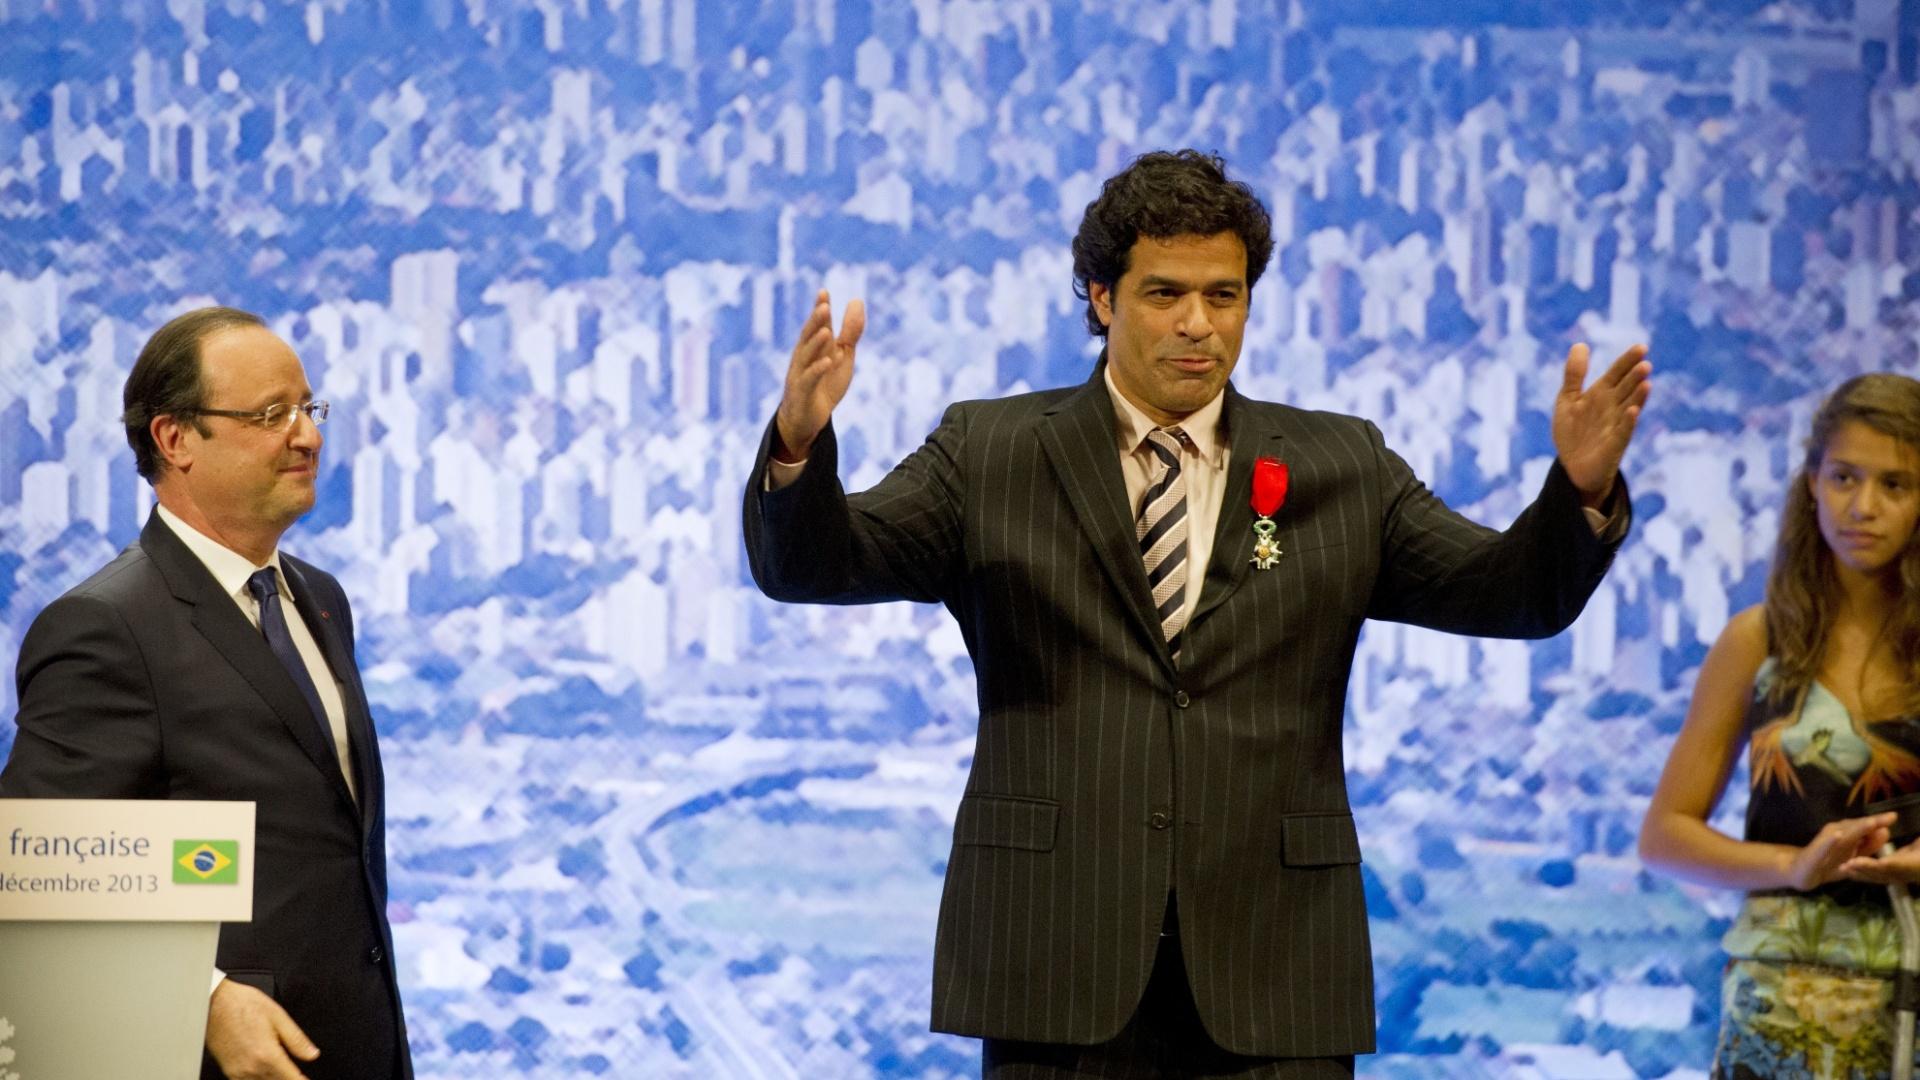 12.dez.2013 - Raí agradece ao público após receber a Legião de Honra francesa